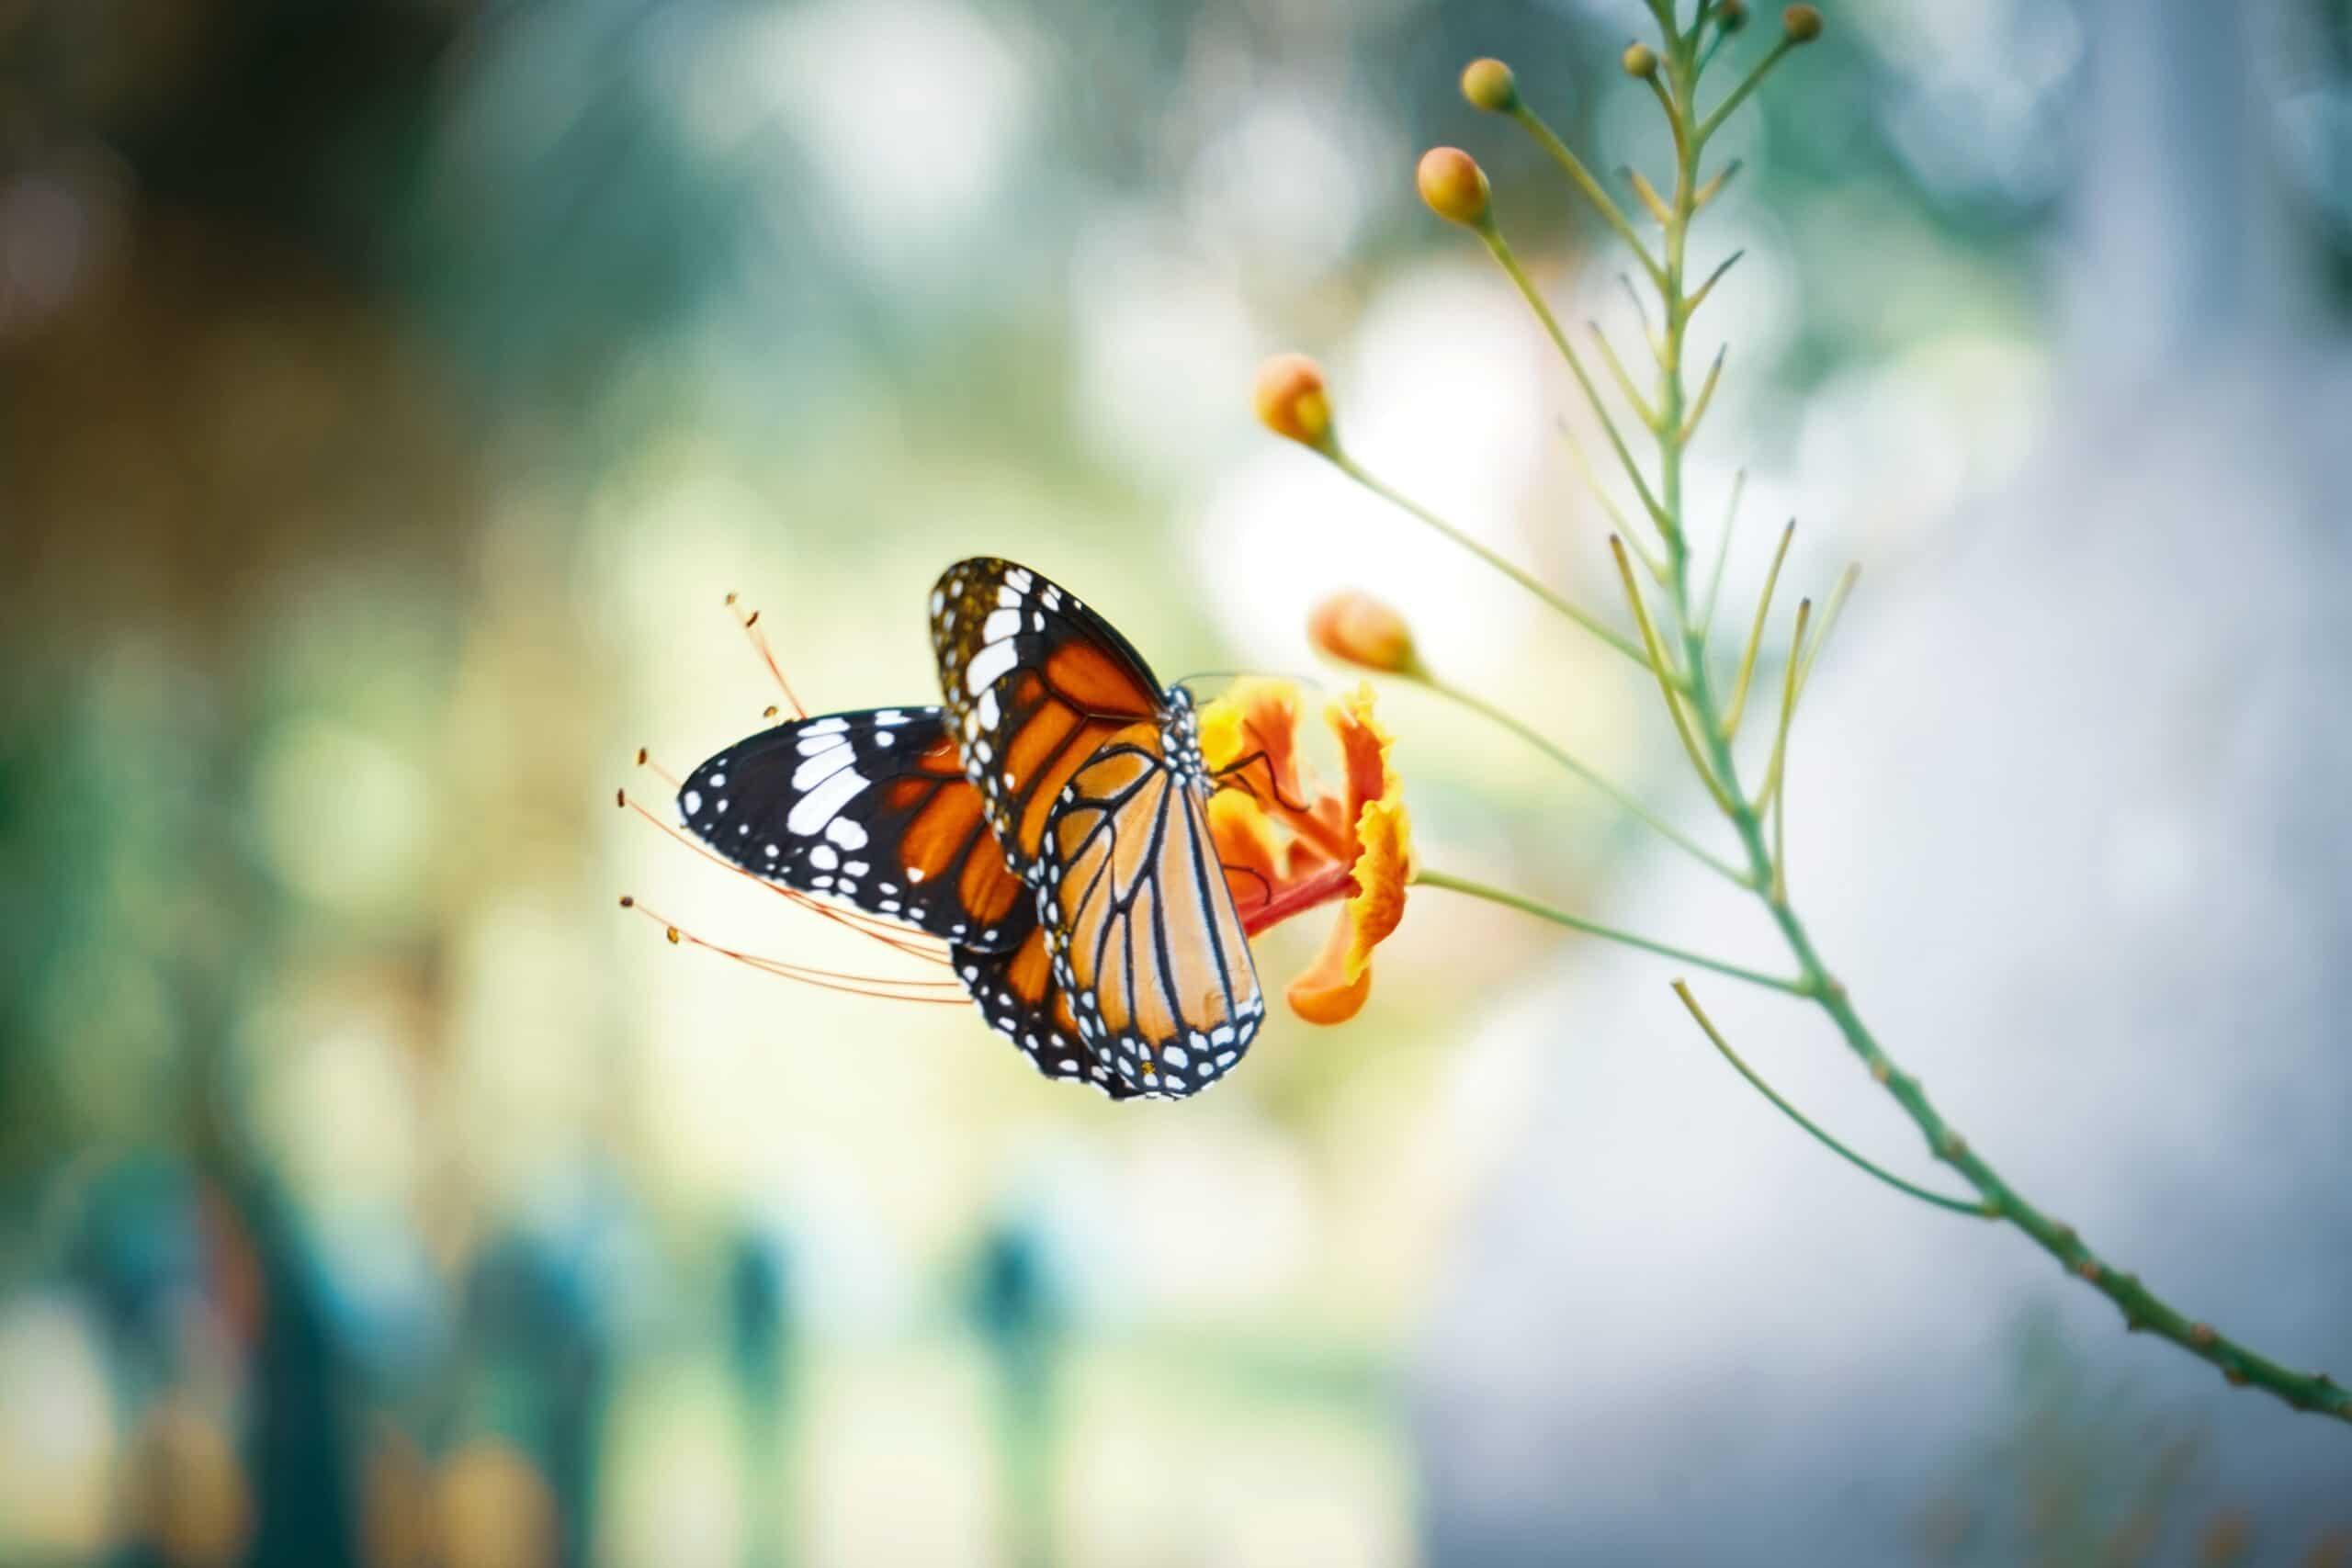 mariposa scaled